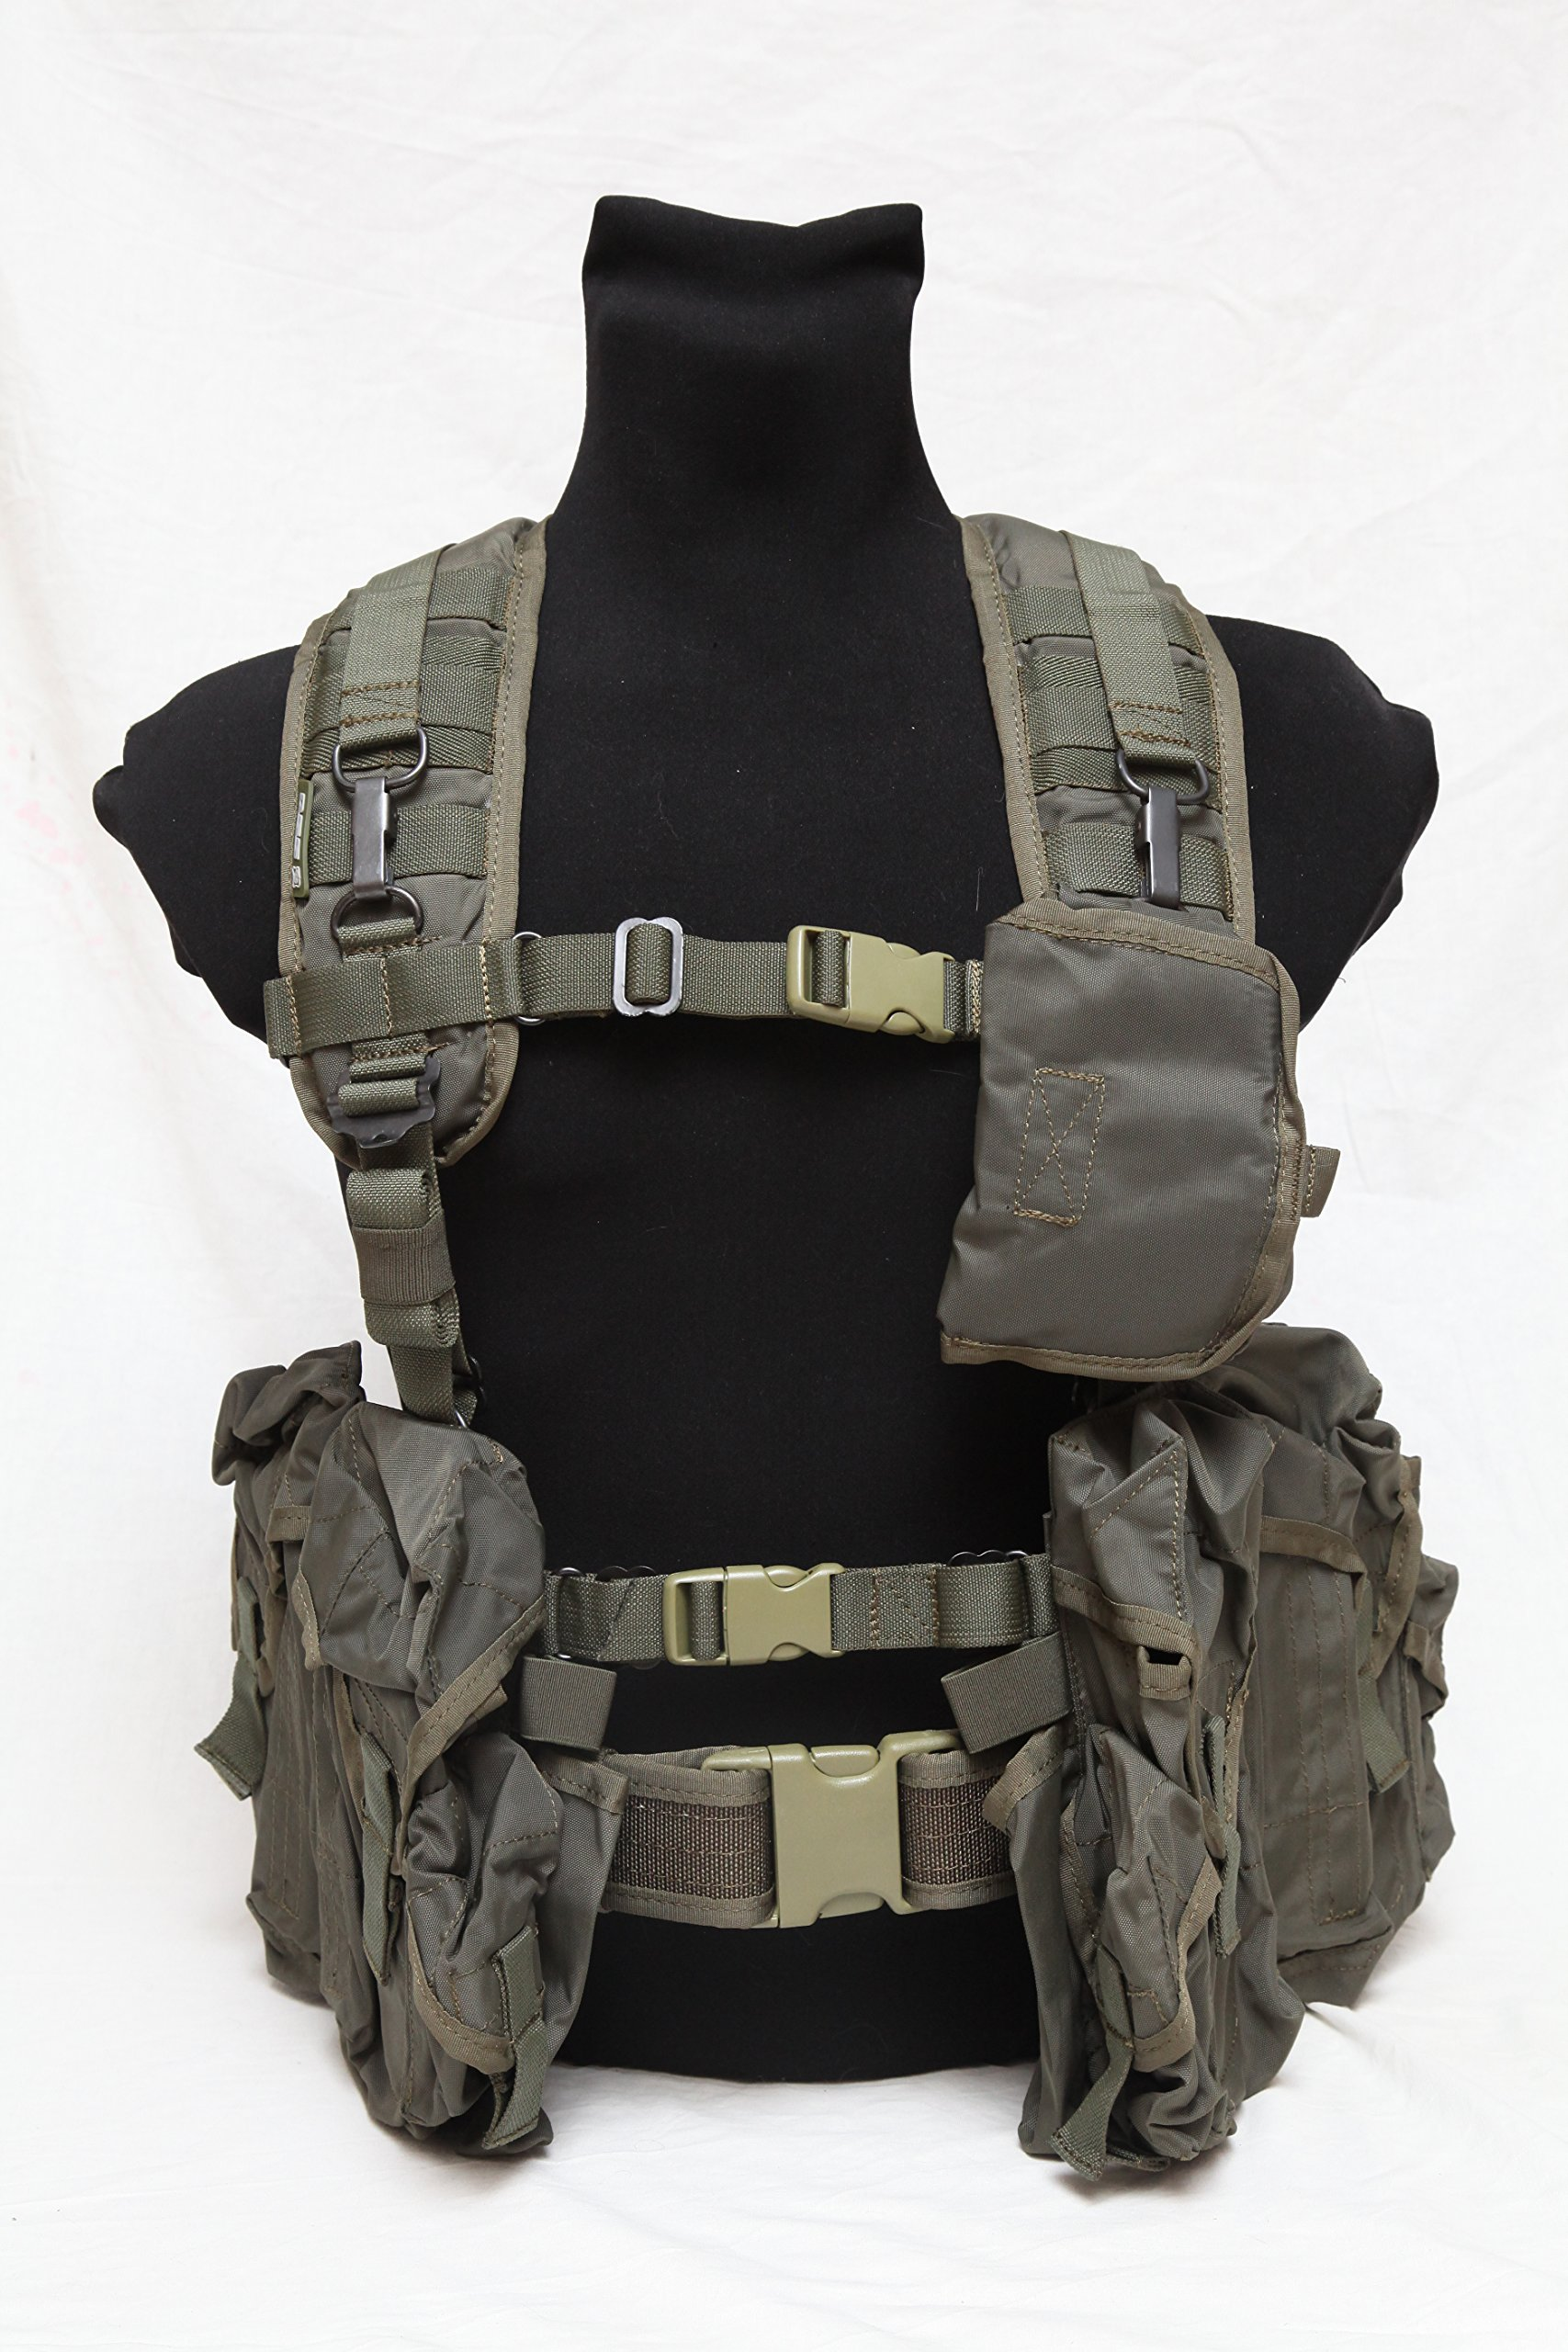 Russian army spetsnaz SPOSN SSO Smersh AK assault vest gear set